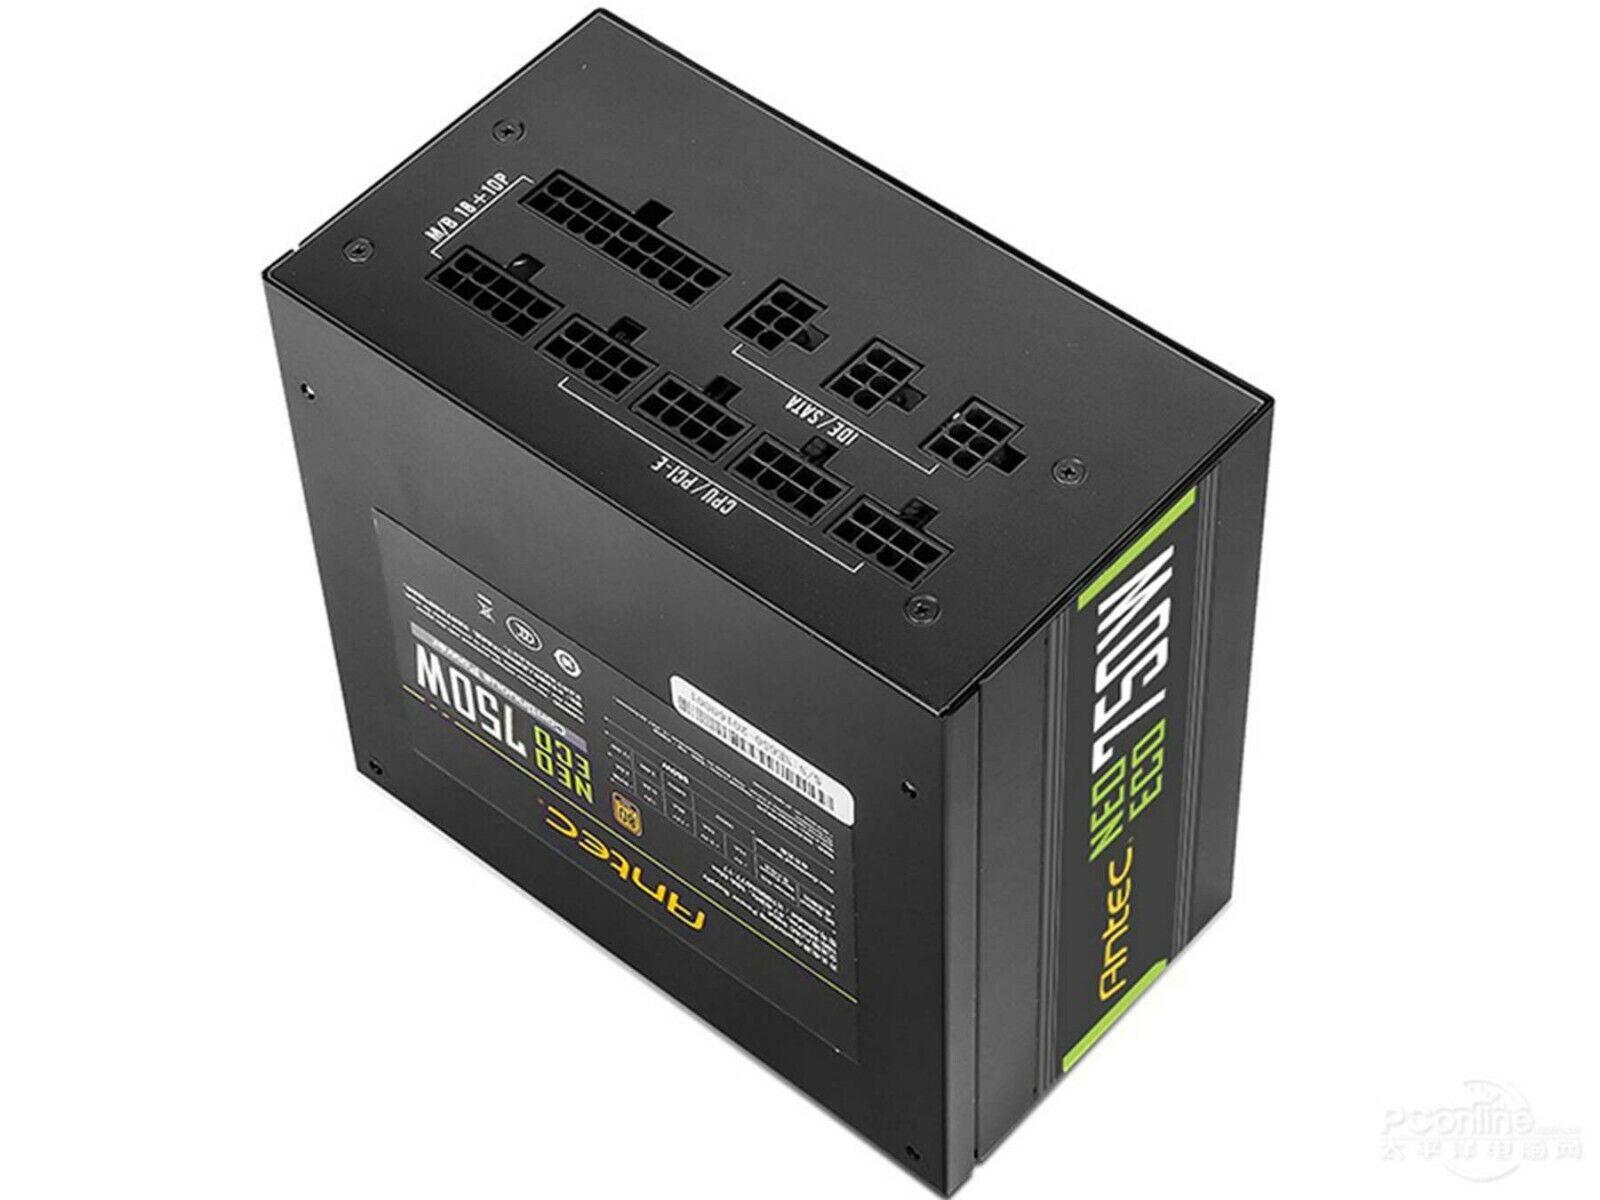 6+2pin PCI-E VGA Power Supply Cable for Antec NE750 Gold and GPU 50cm